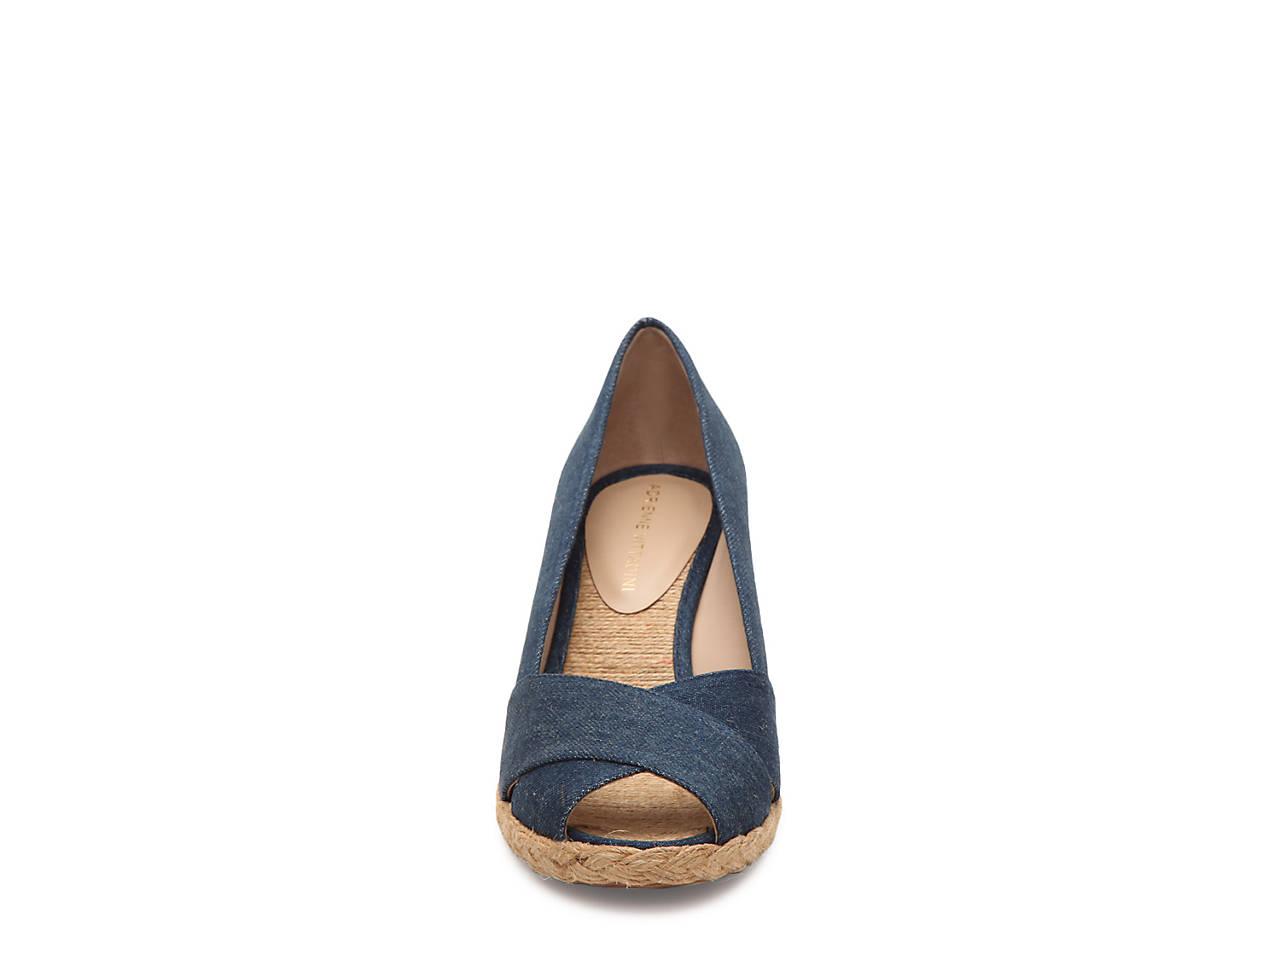 20d63abbc730 Adrienne Vittadini Bailee Wedge Pump Women s Shoes